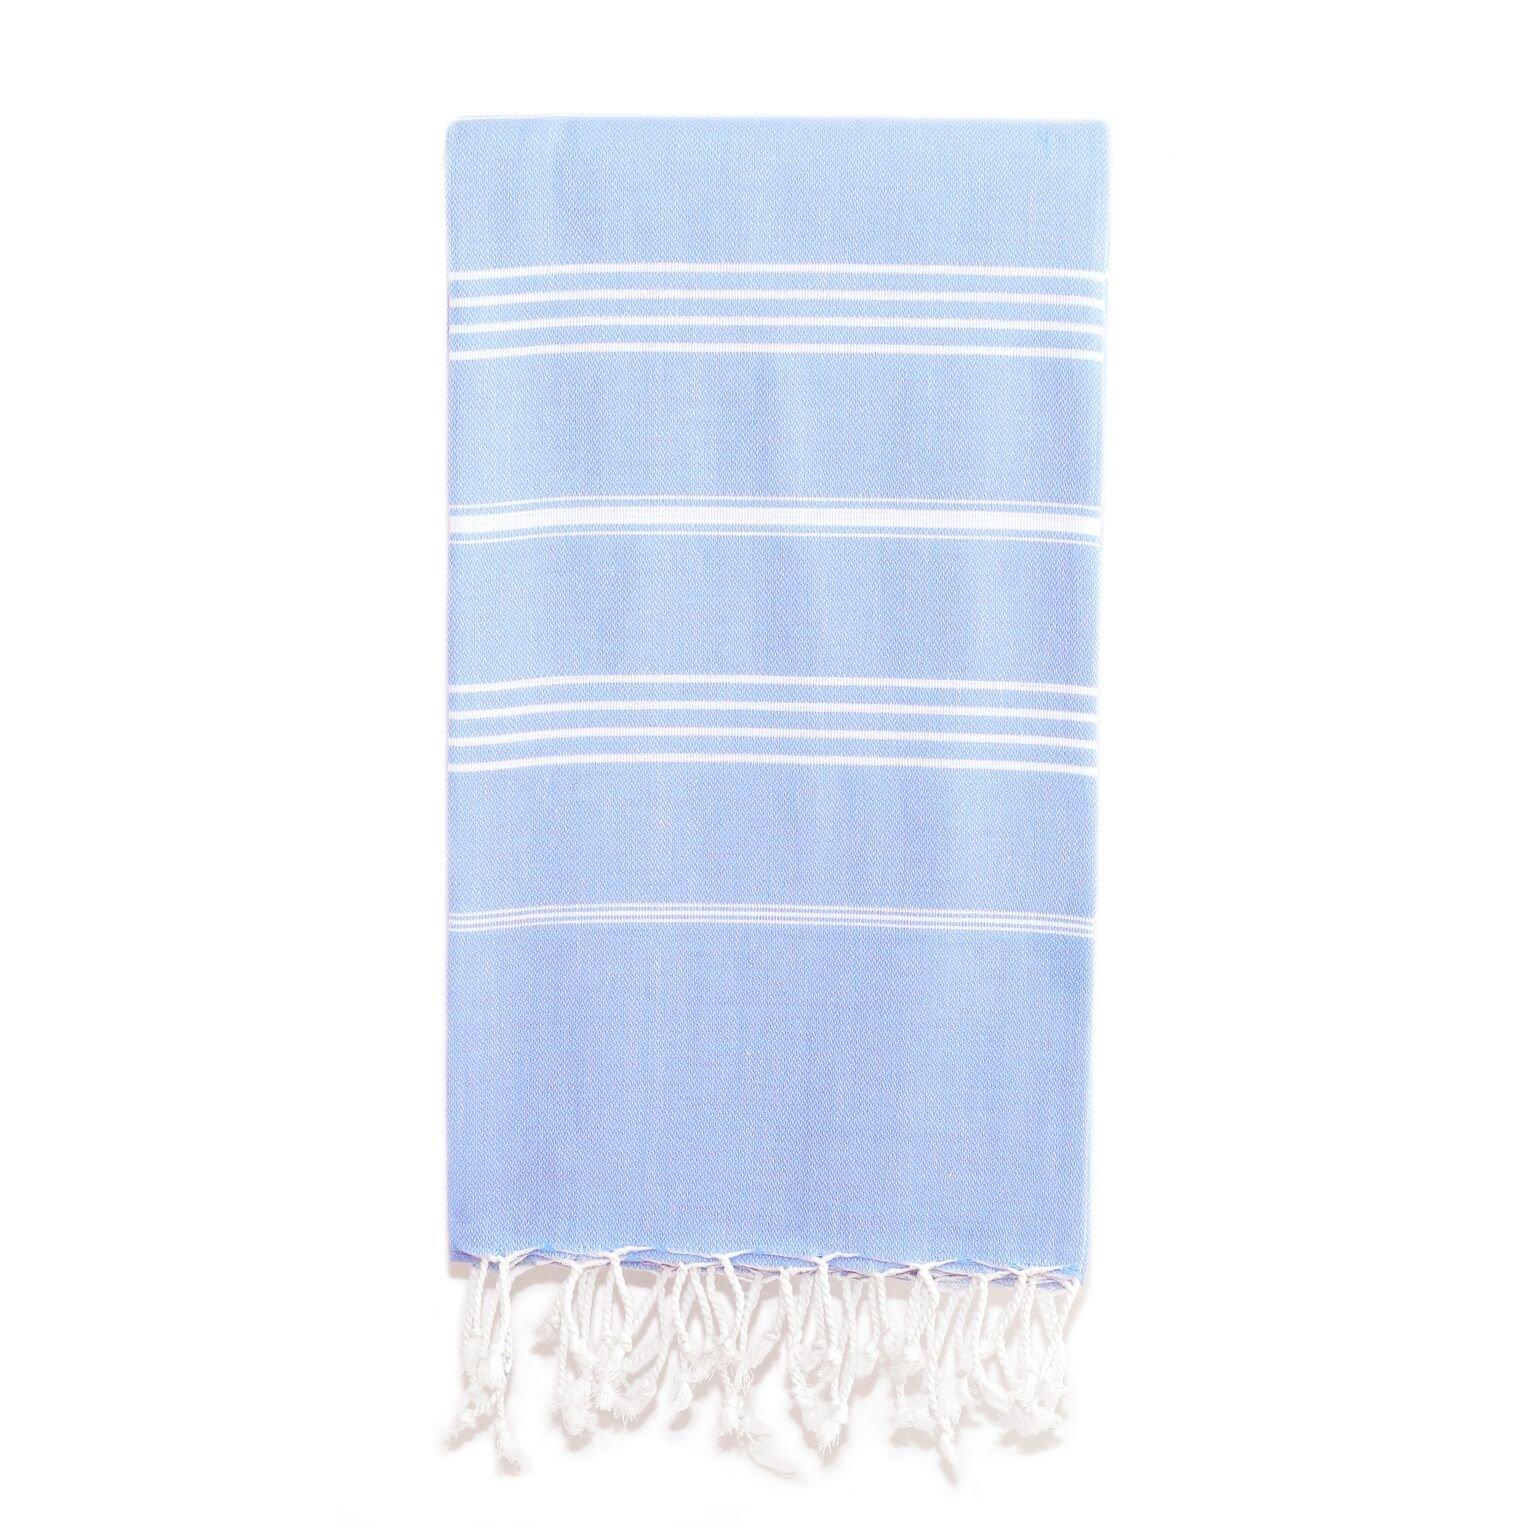 Linum Home Textiles Turkish Cotton Lucky Pestemal, Peshtemal, Fota Beach Bath Towel